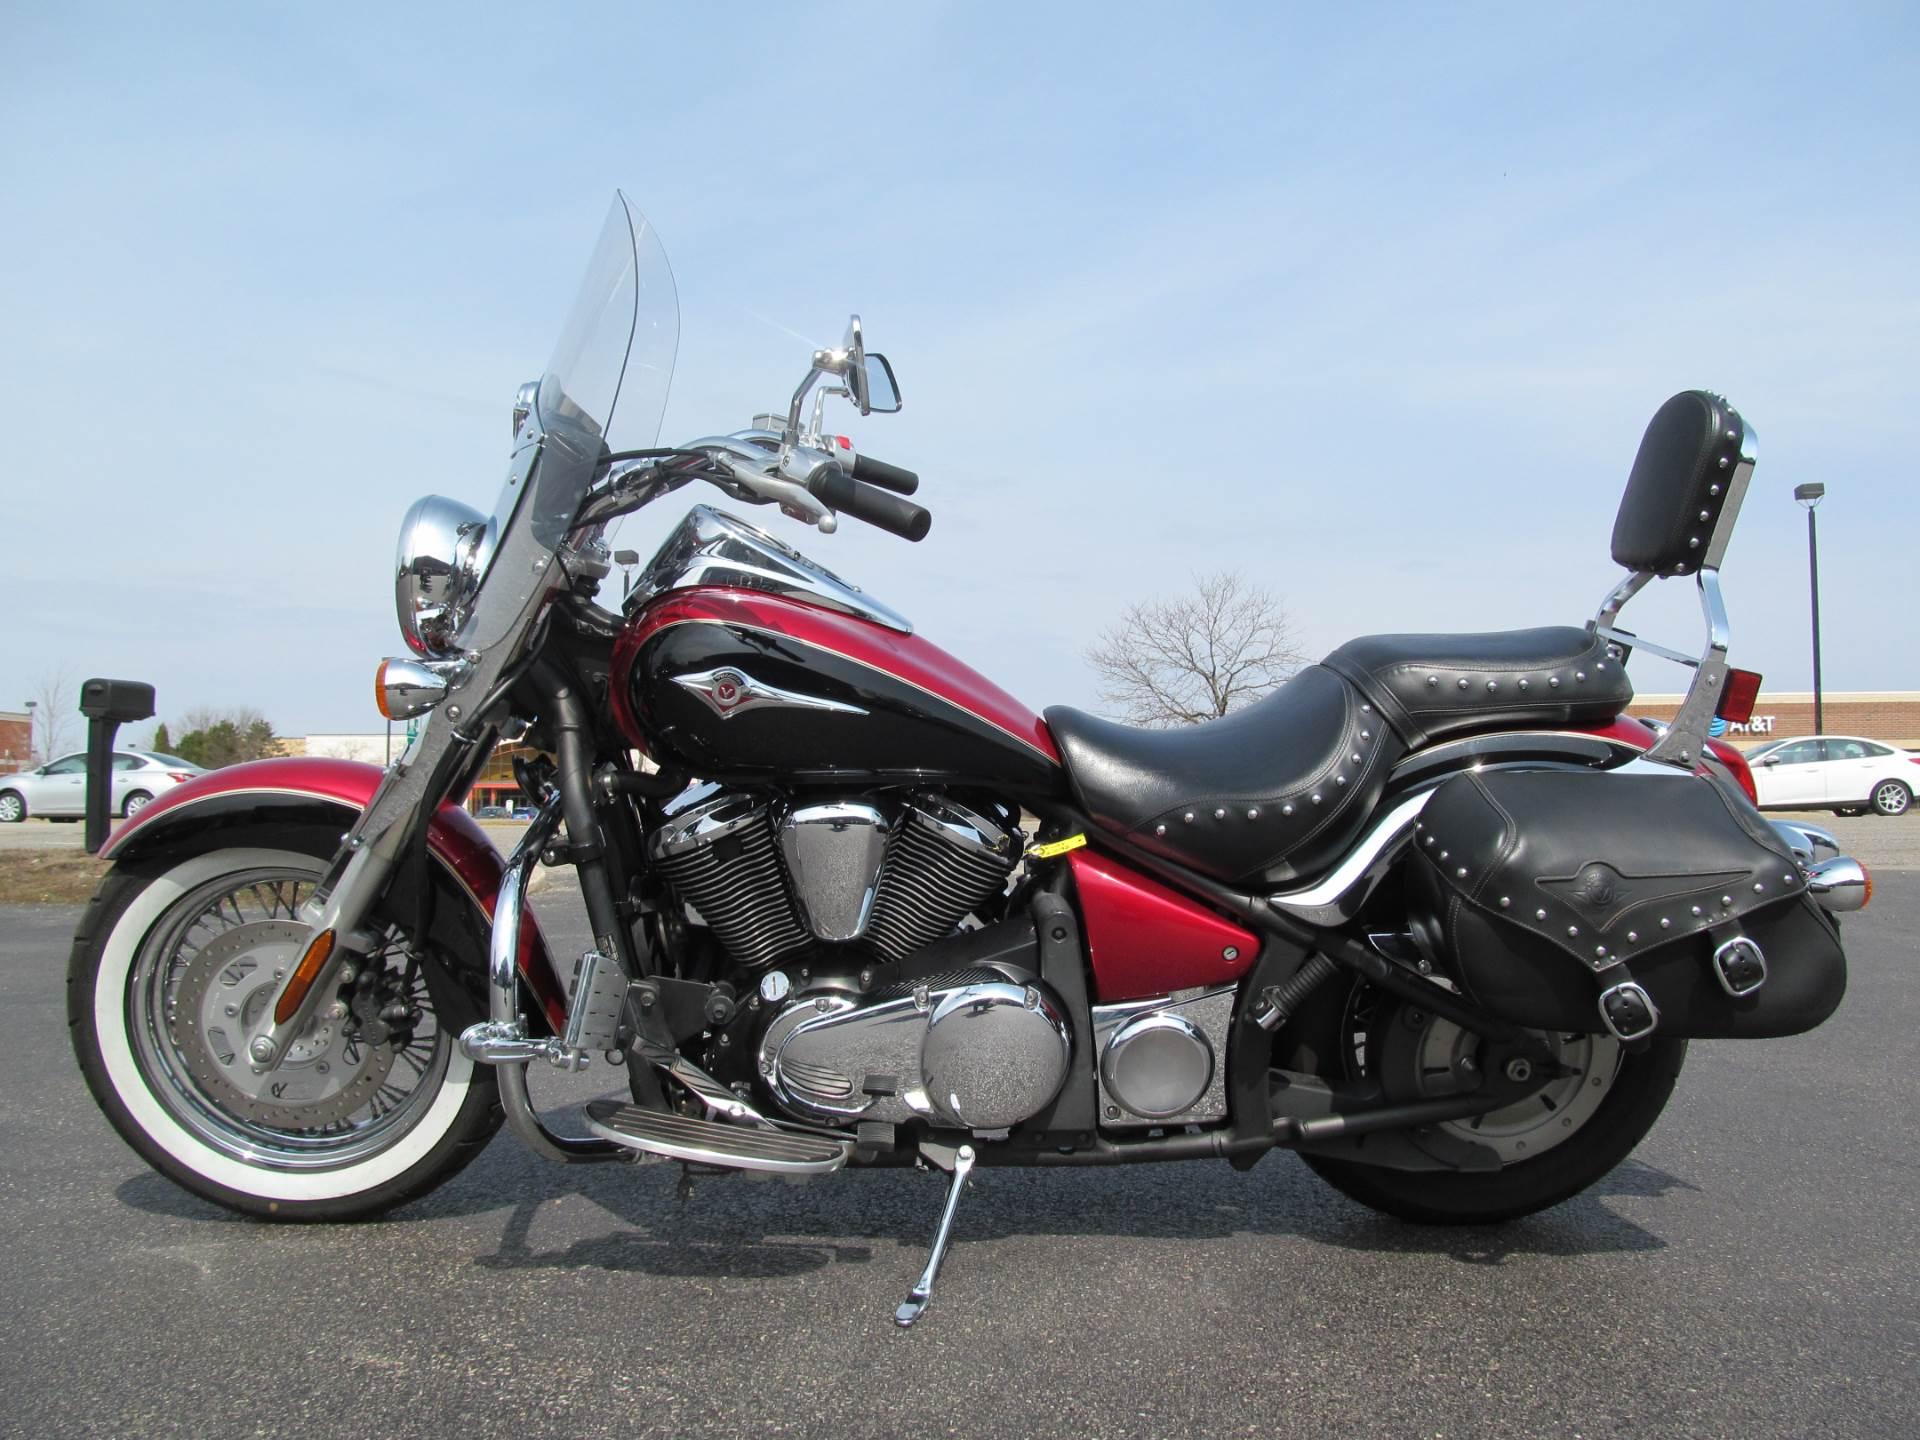 2008 Kawasaki Vulcan® 900 Classic LT in Crystal Lake, Illinois